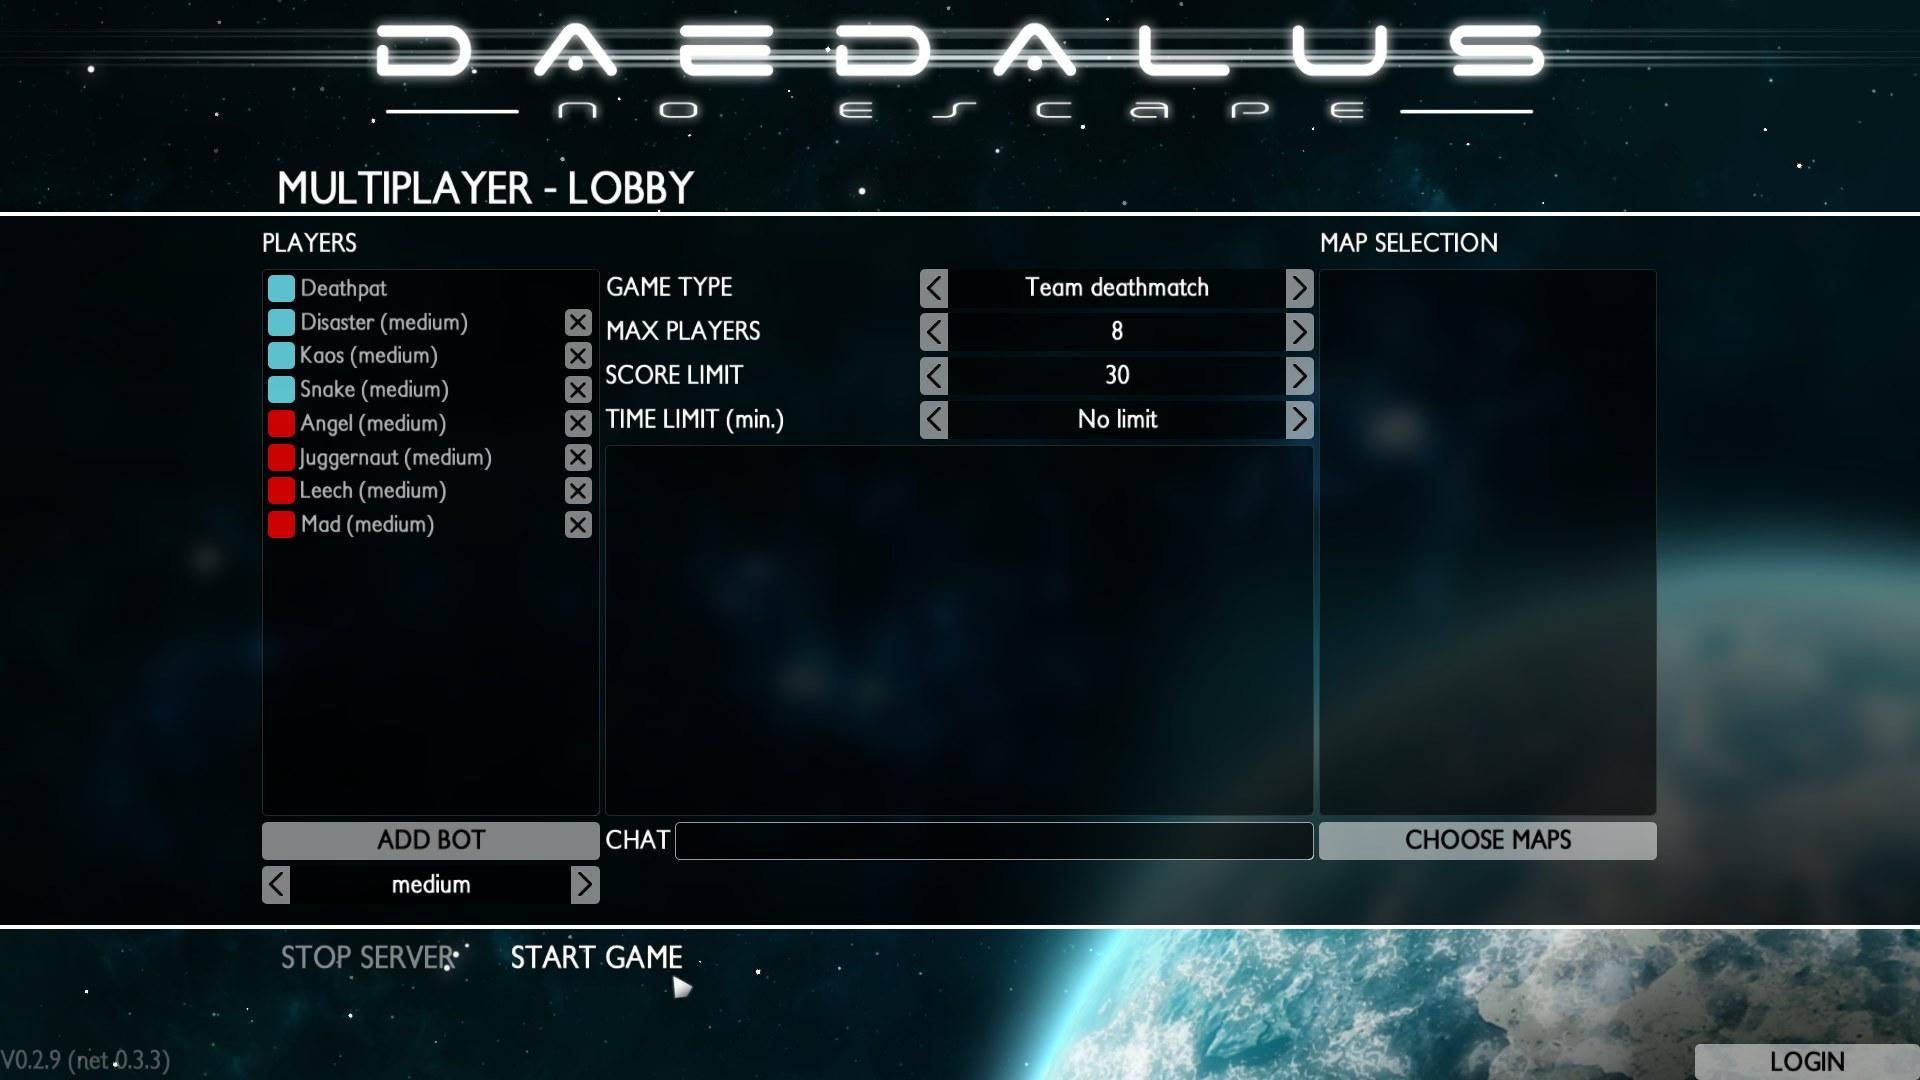 IMAGE(http://www.daedalus-thegame.com/images/screenshots/new_lobby.jpg)